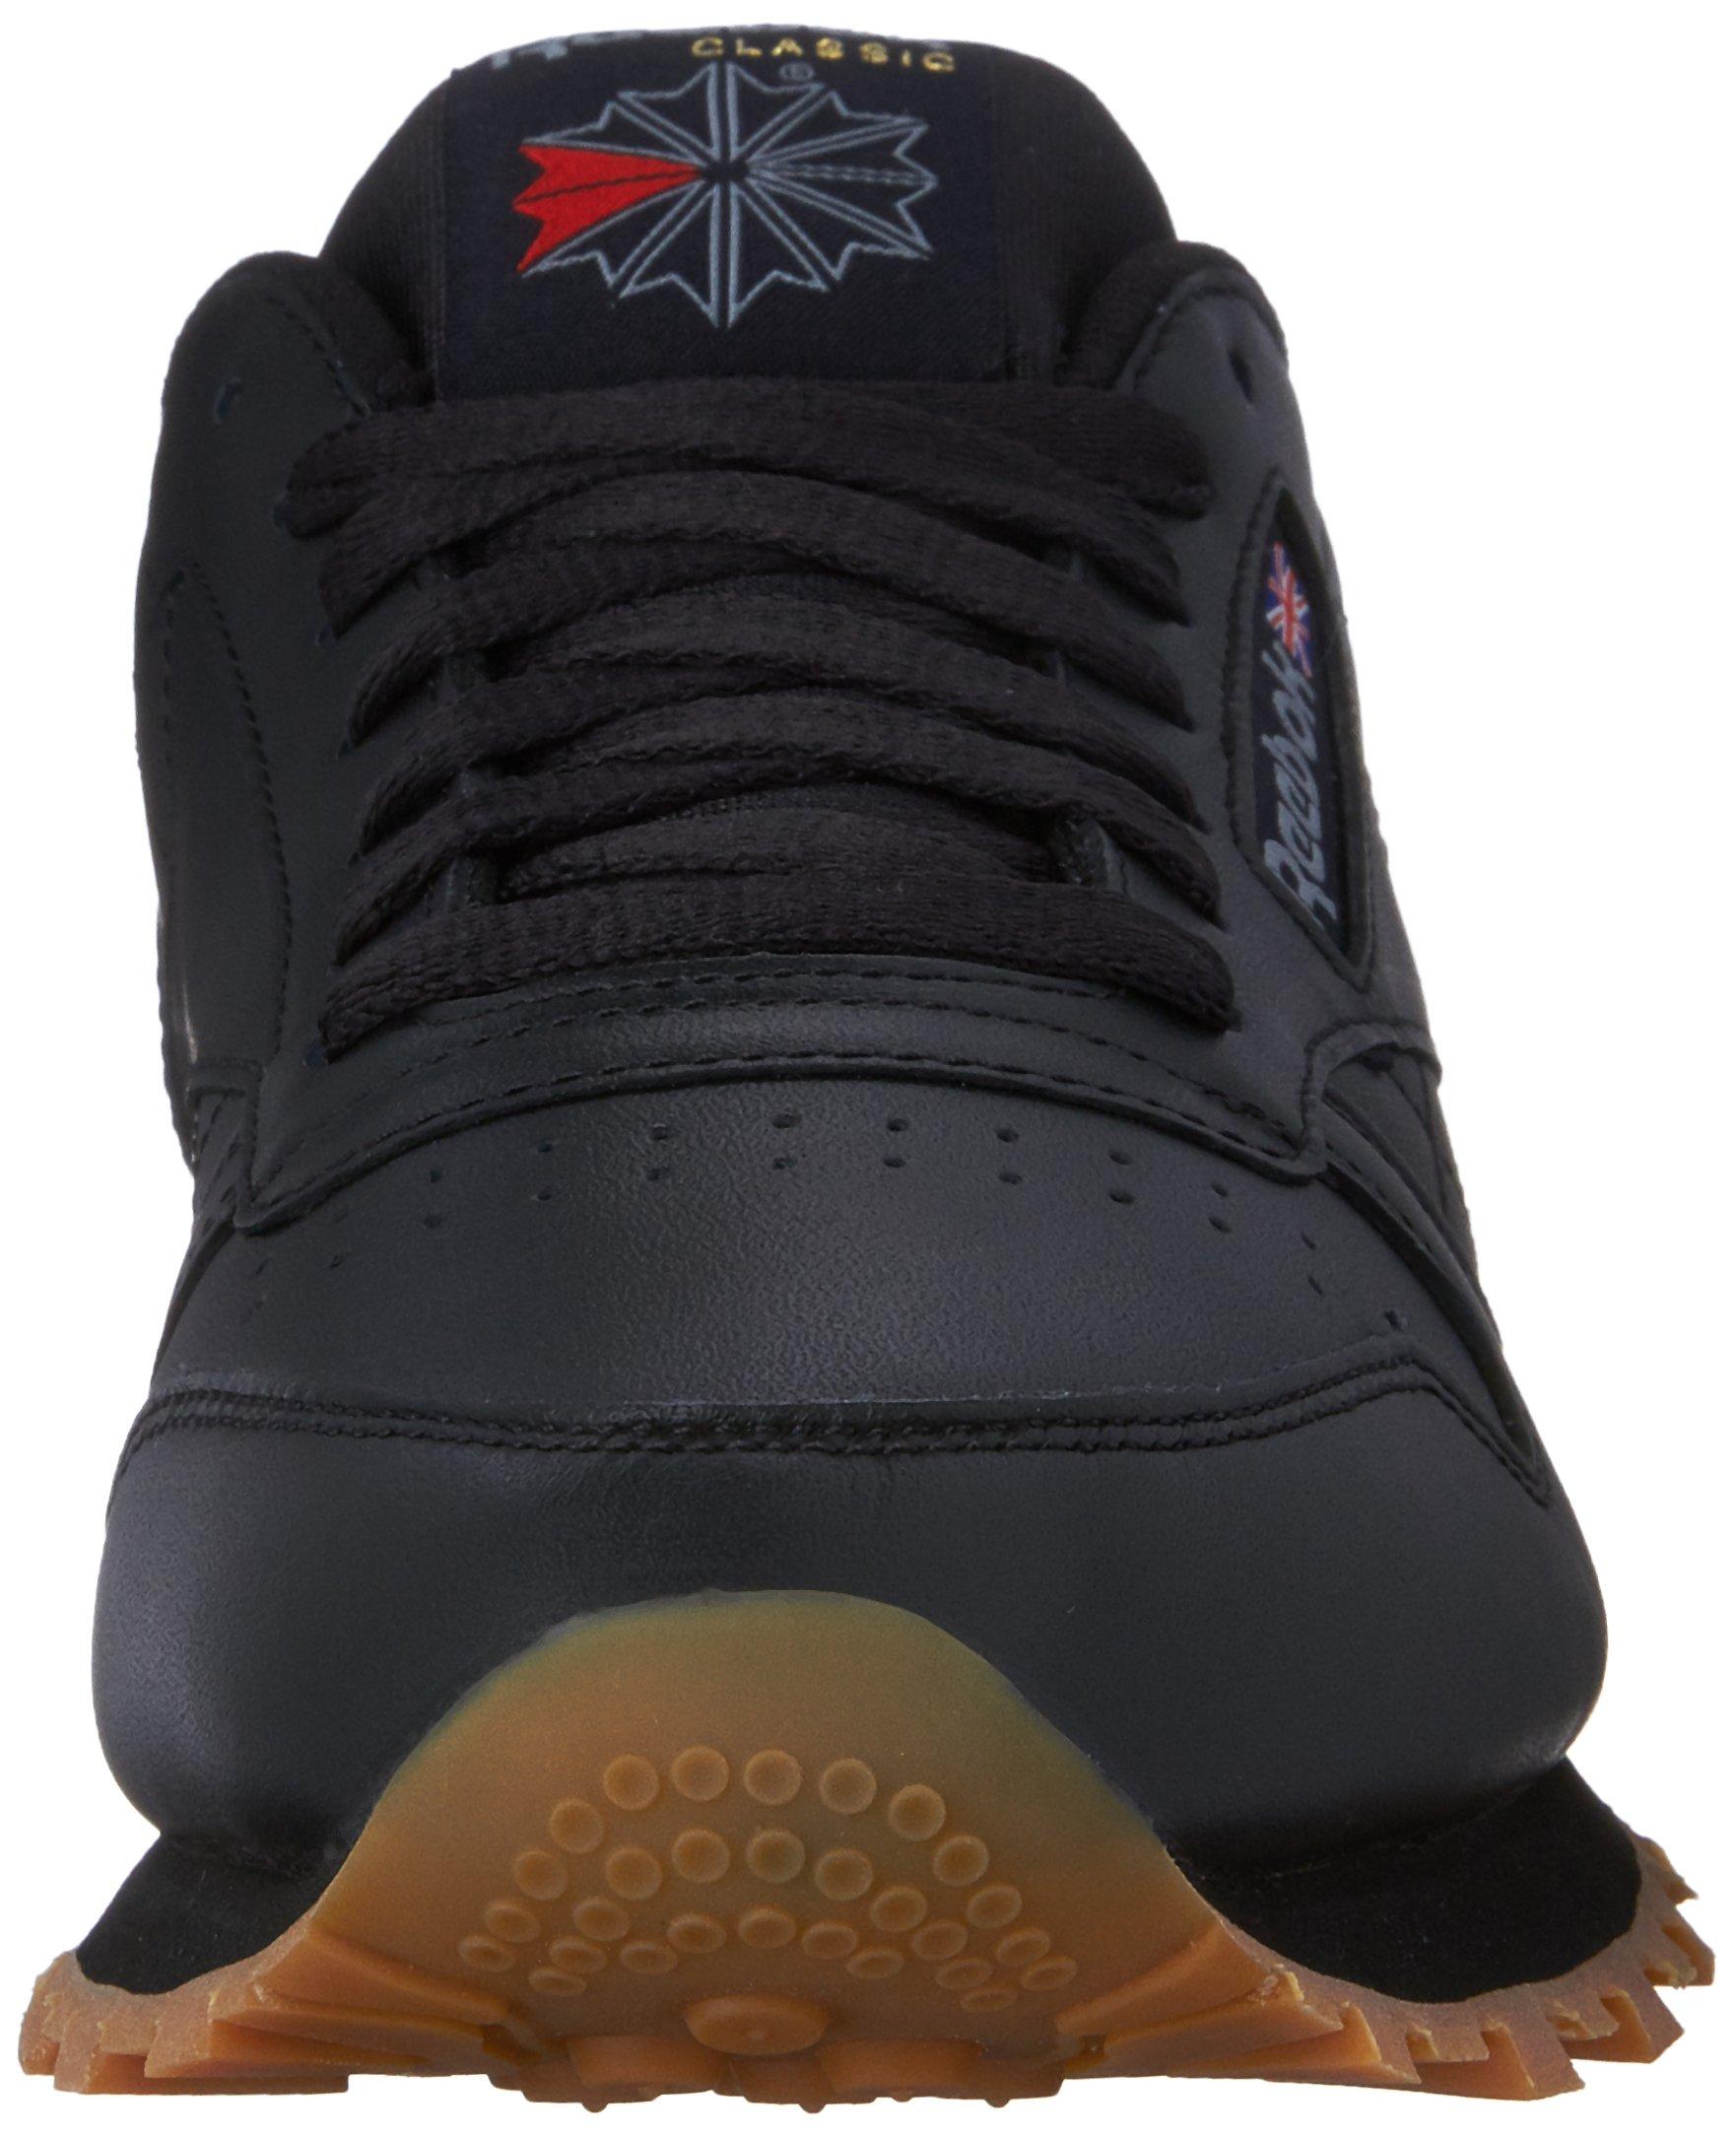 8972c2e7d8b Reebok Men s Classic Leather Sneaker